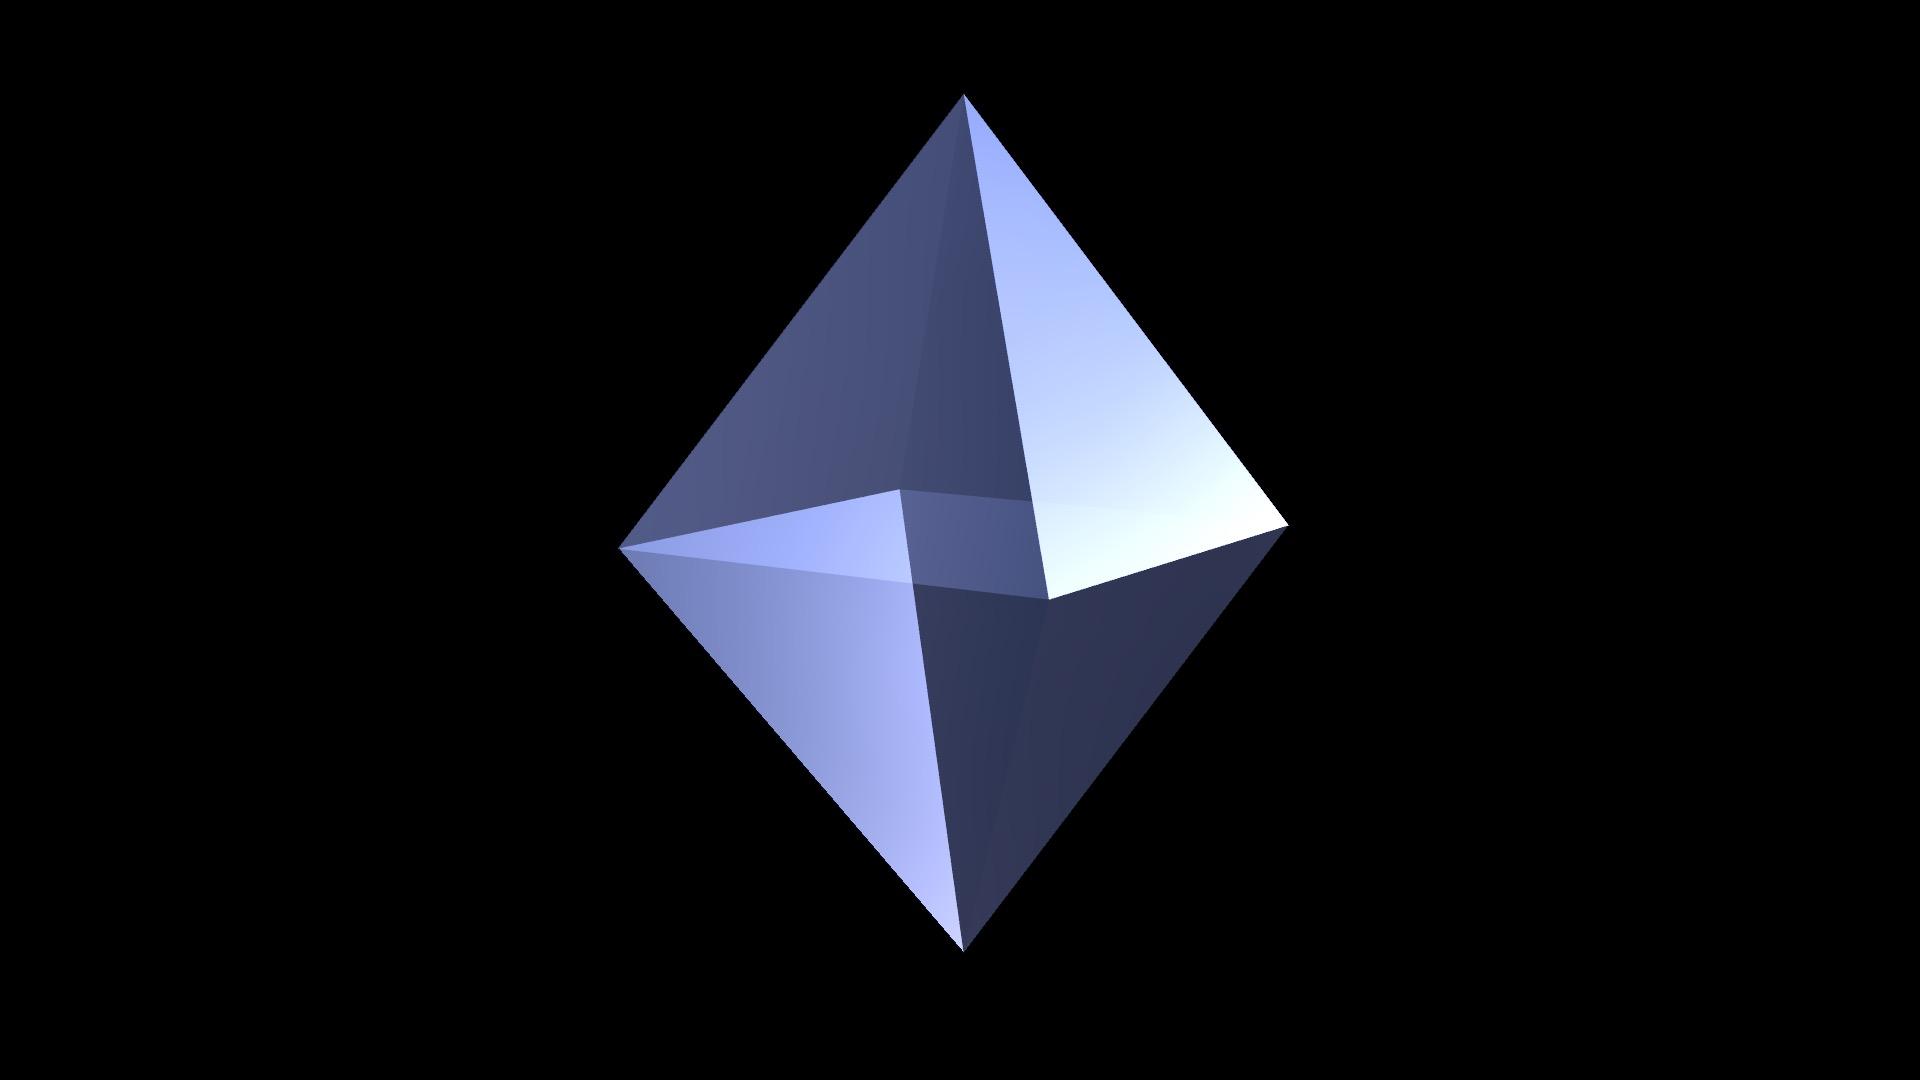 pyramids tetrahedrons demo 1